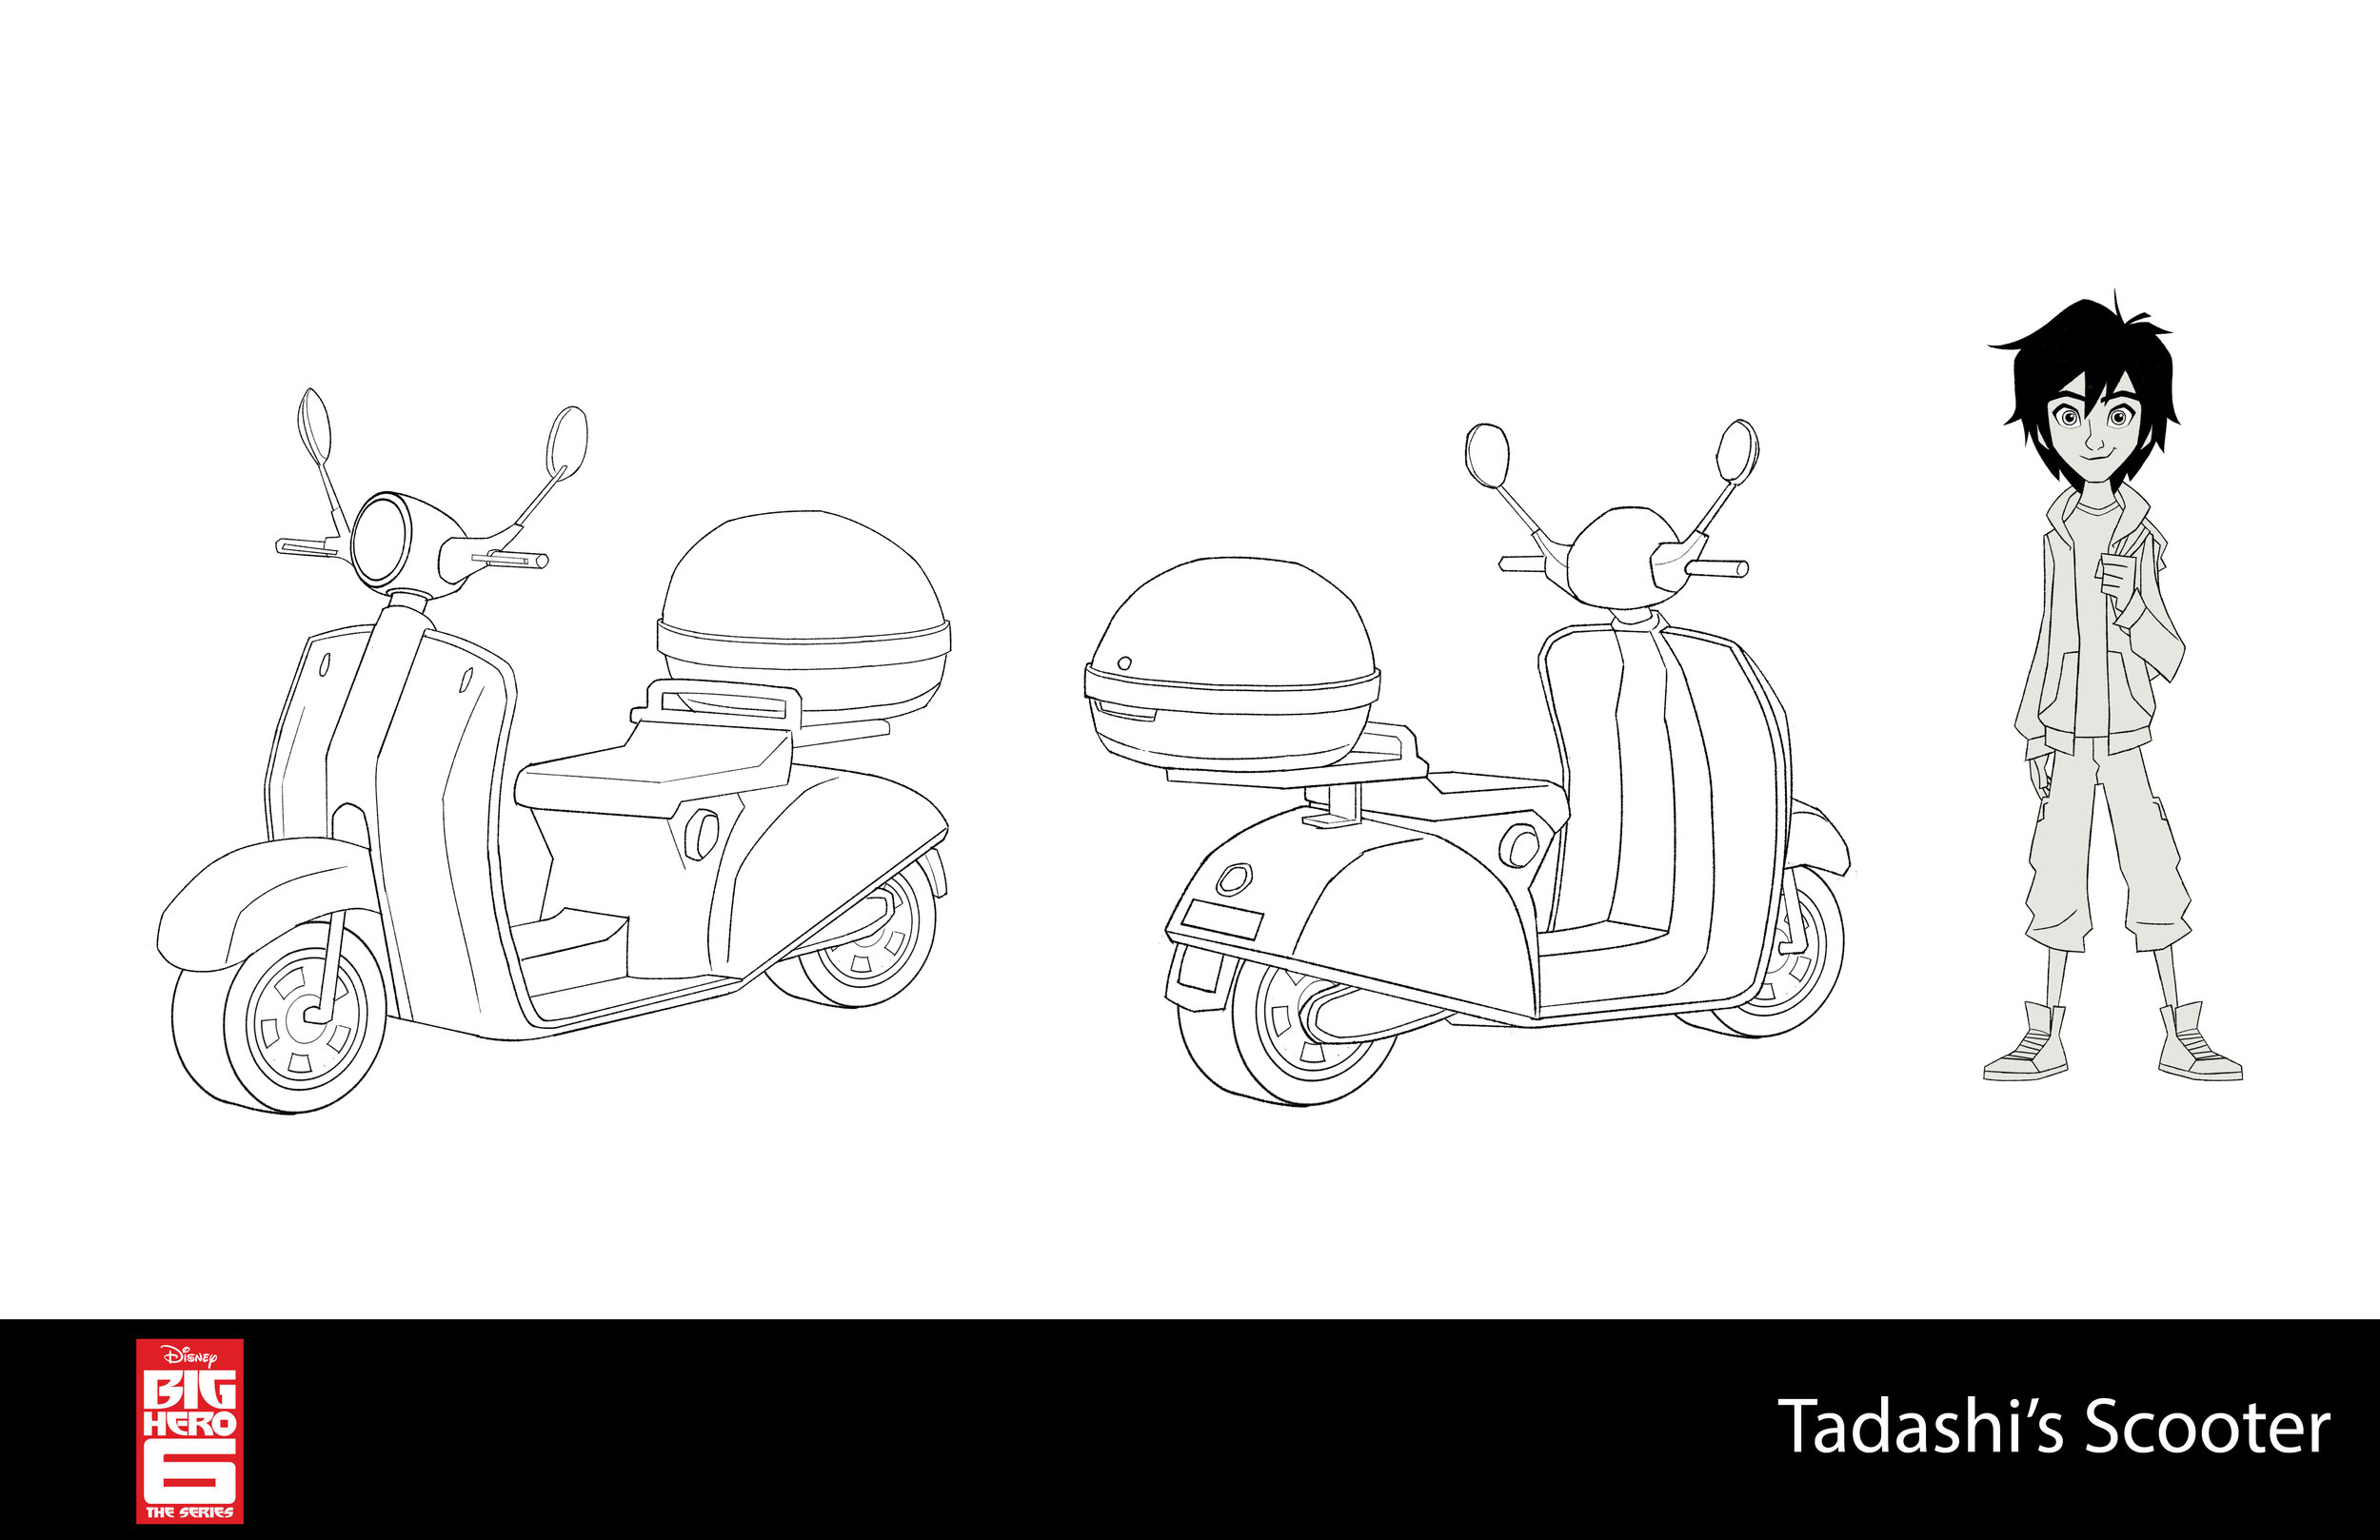 109_TadashiScooter_C_V01_BS.jpg